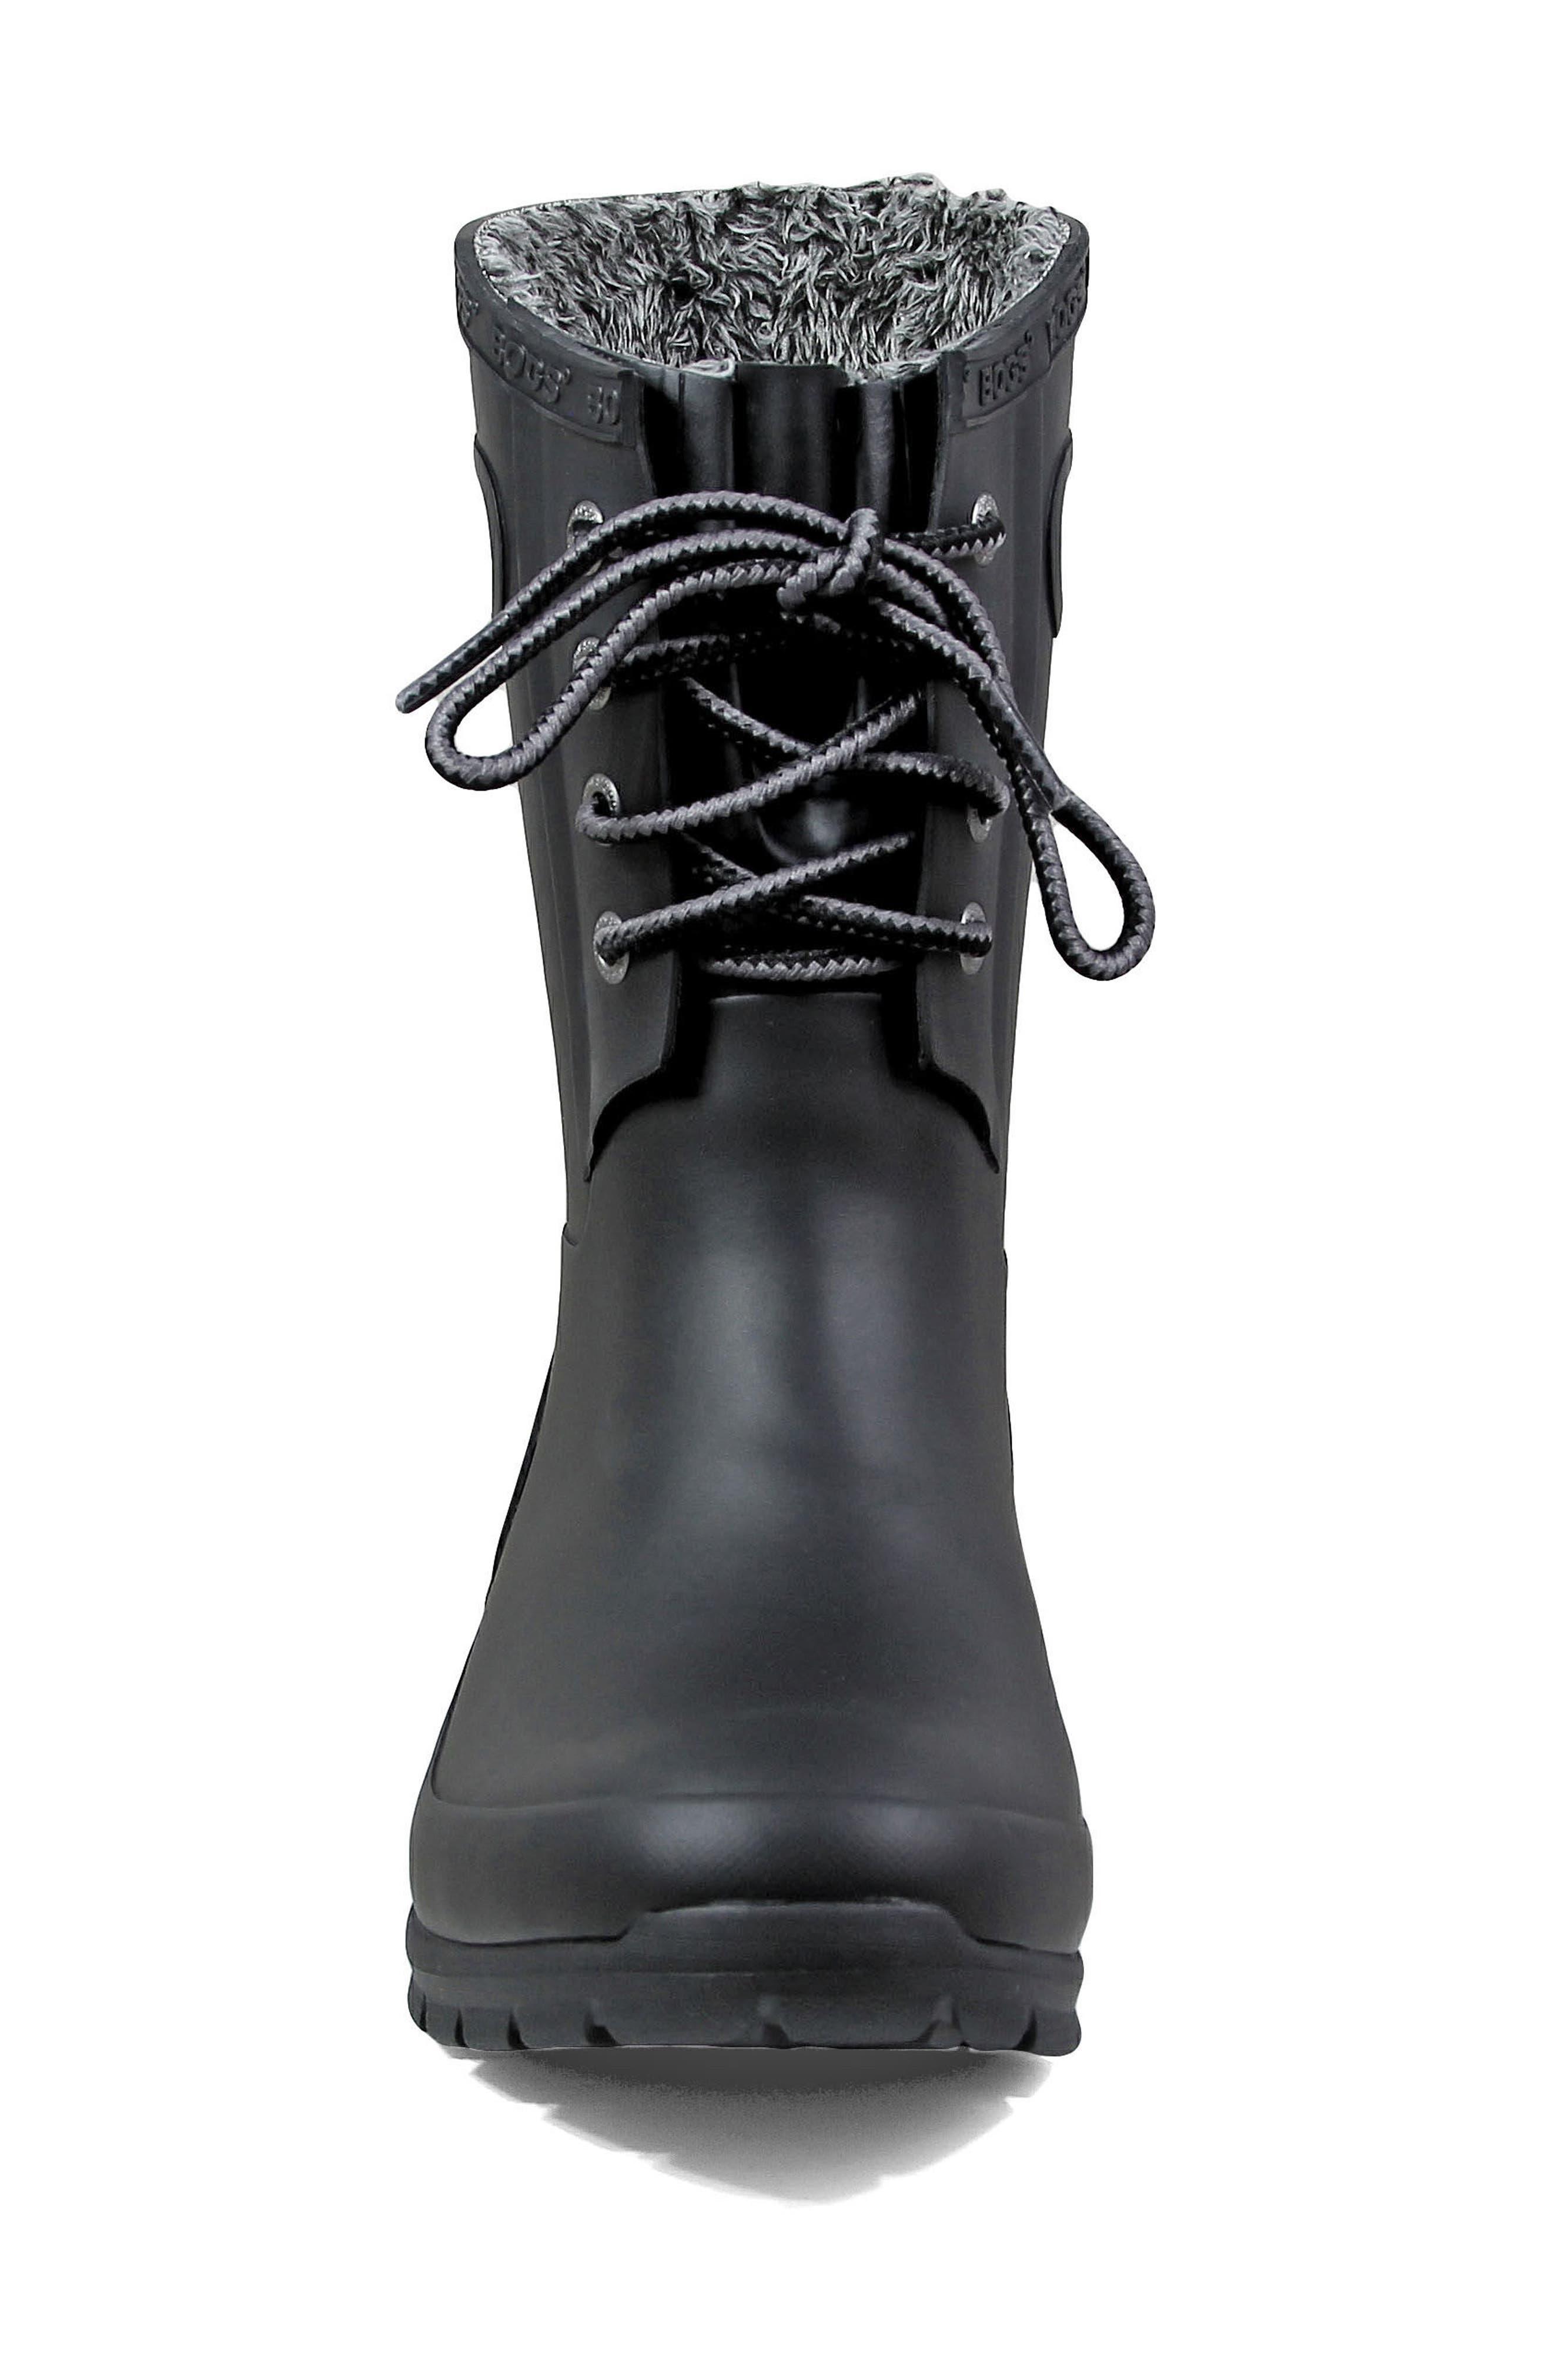 BOGS, Amanda Plush Waterproof Rain Boot, Alternate thumbnail 4, color, 001